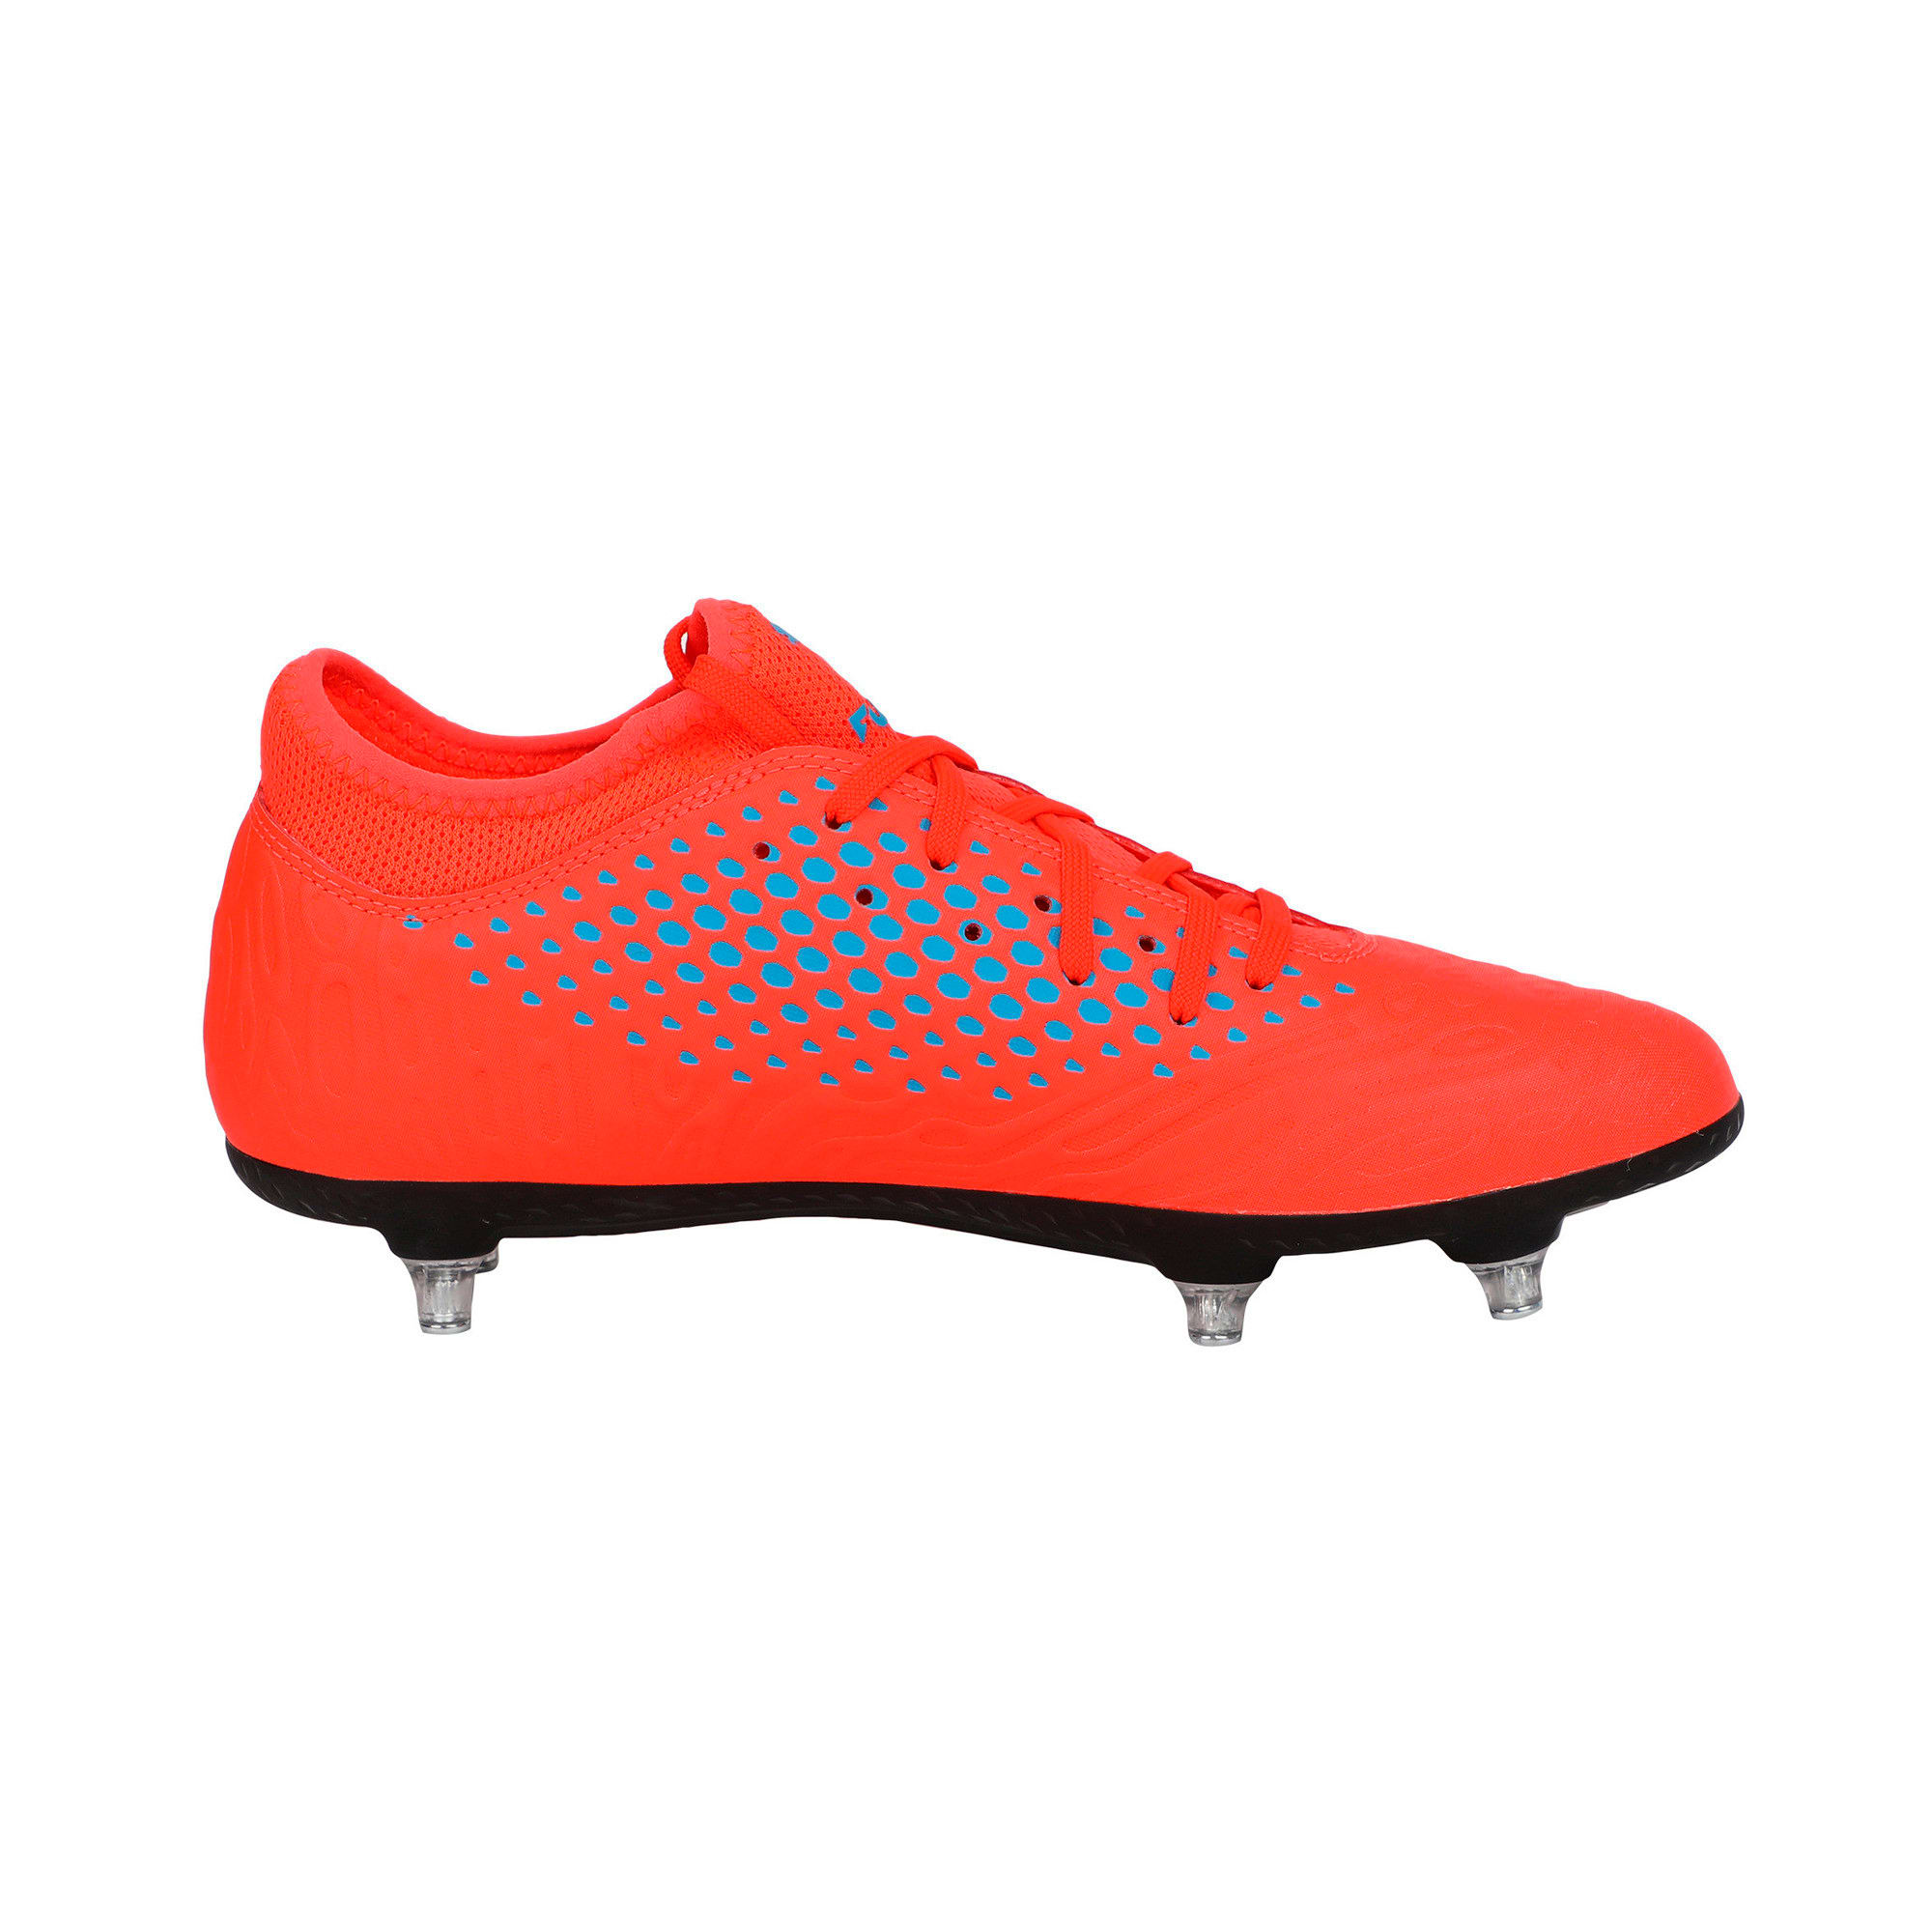 Thumbnail 5 of FUTURE 19.4 SG Men's Football Boots, Red Blast-Bleu Azur, medium-IND